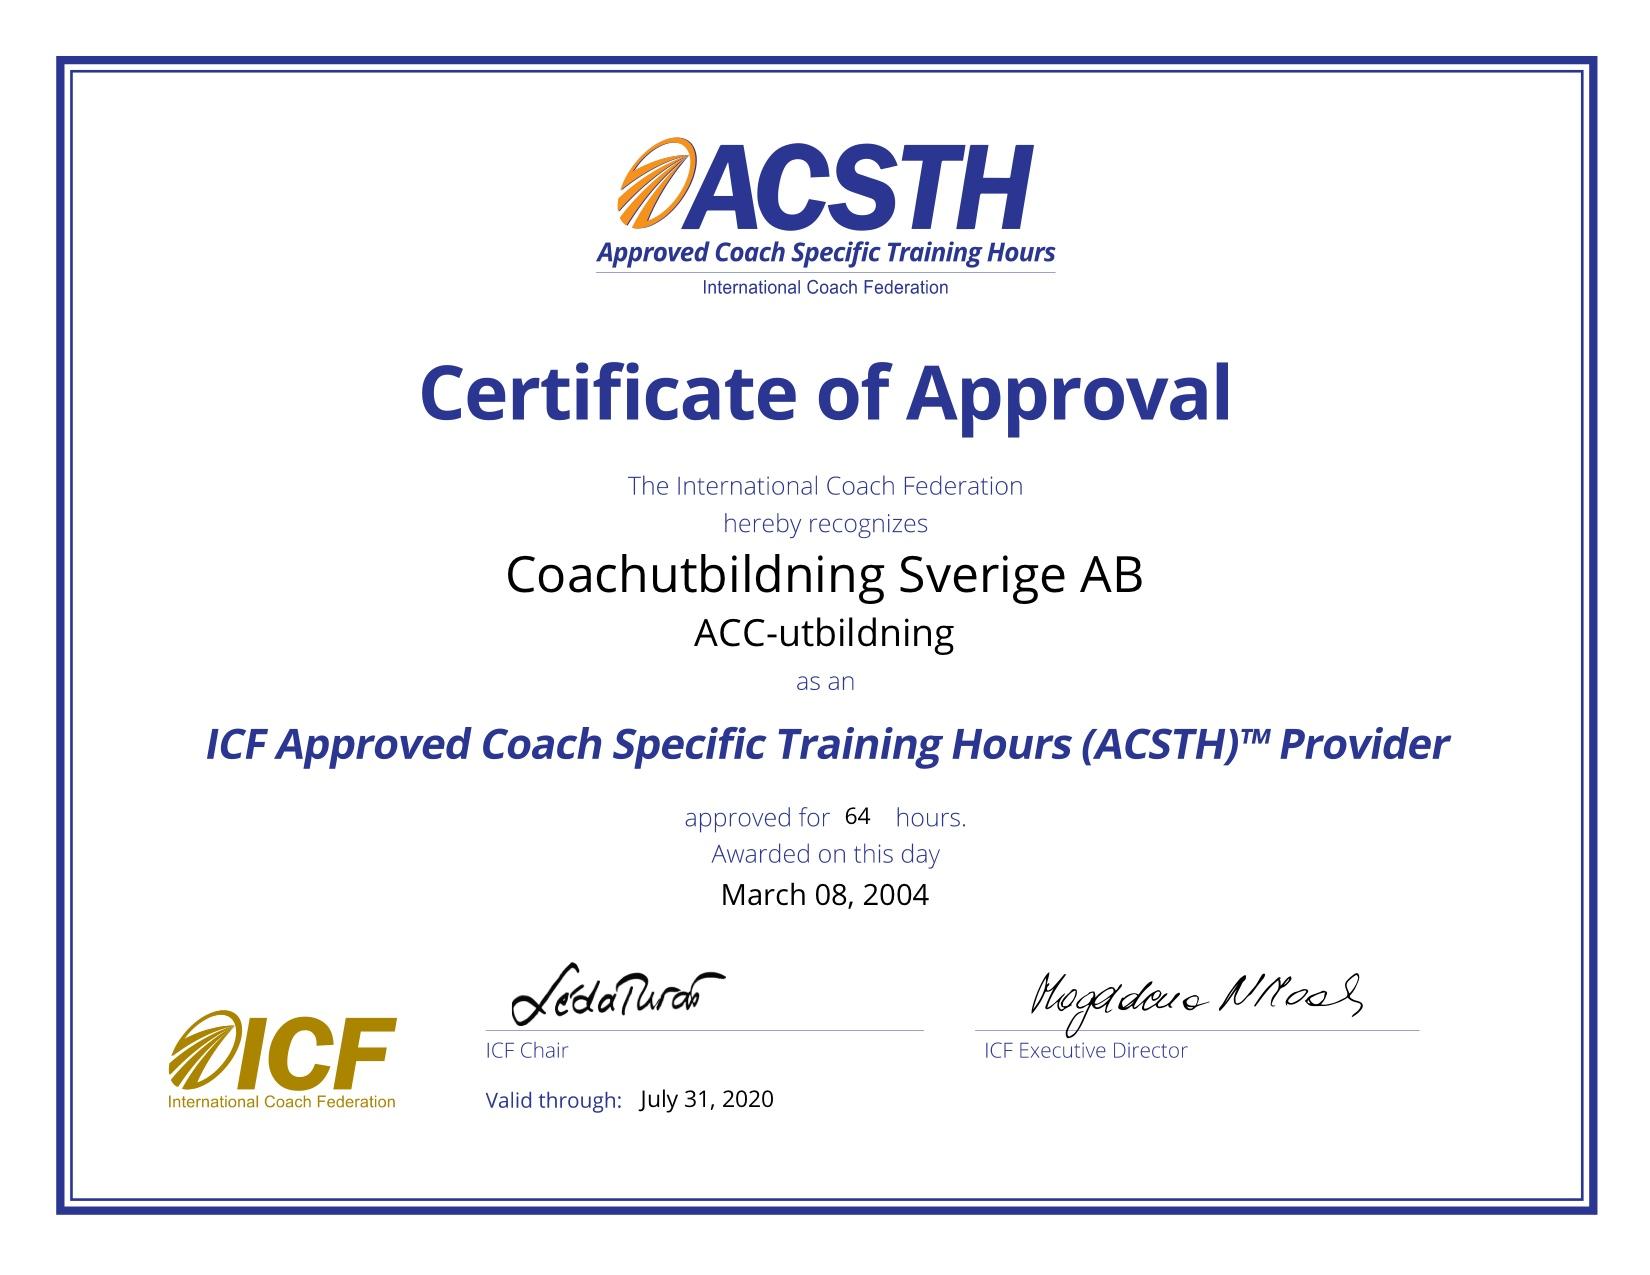 2. ACSTH Certificate